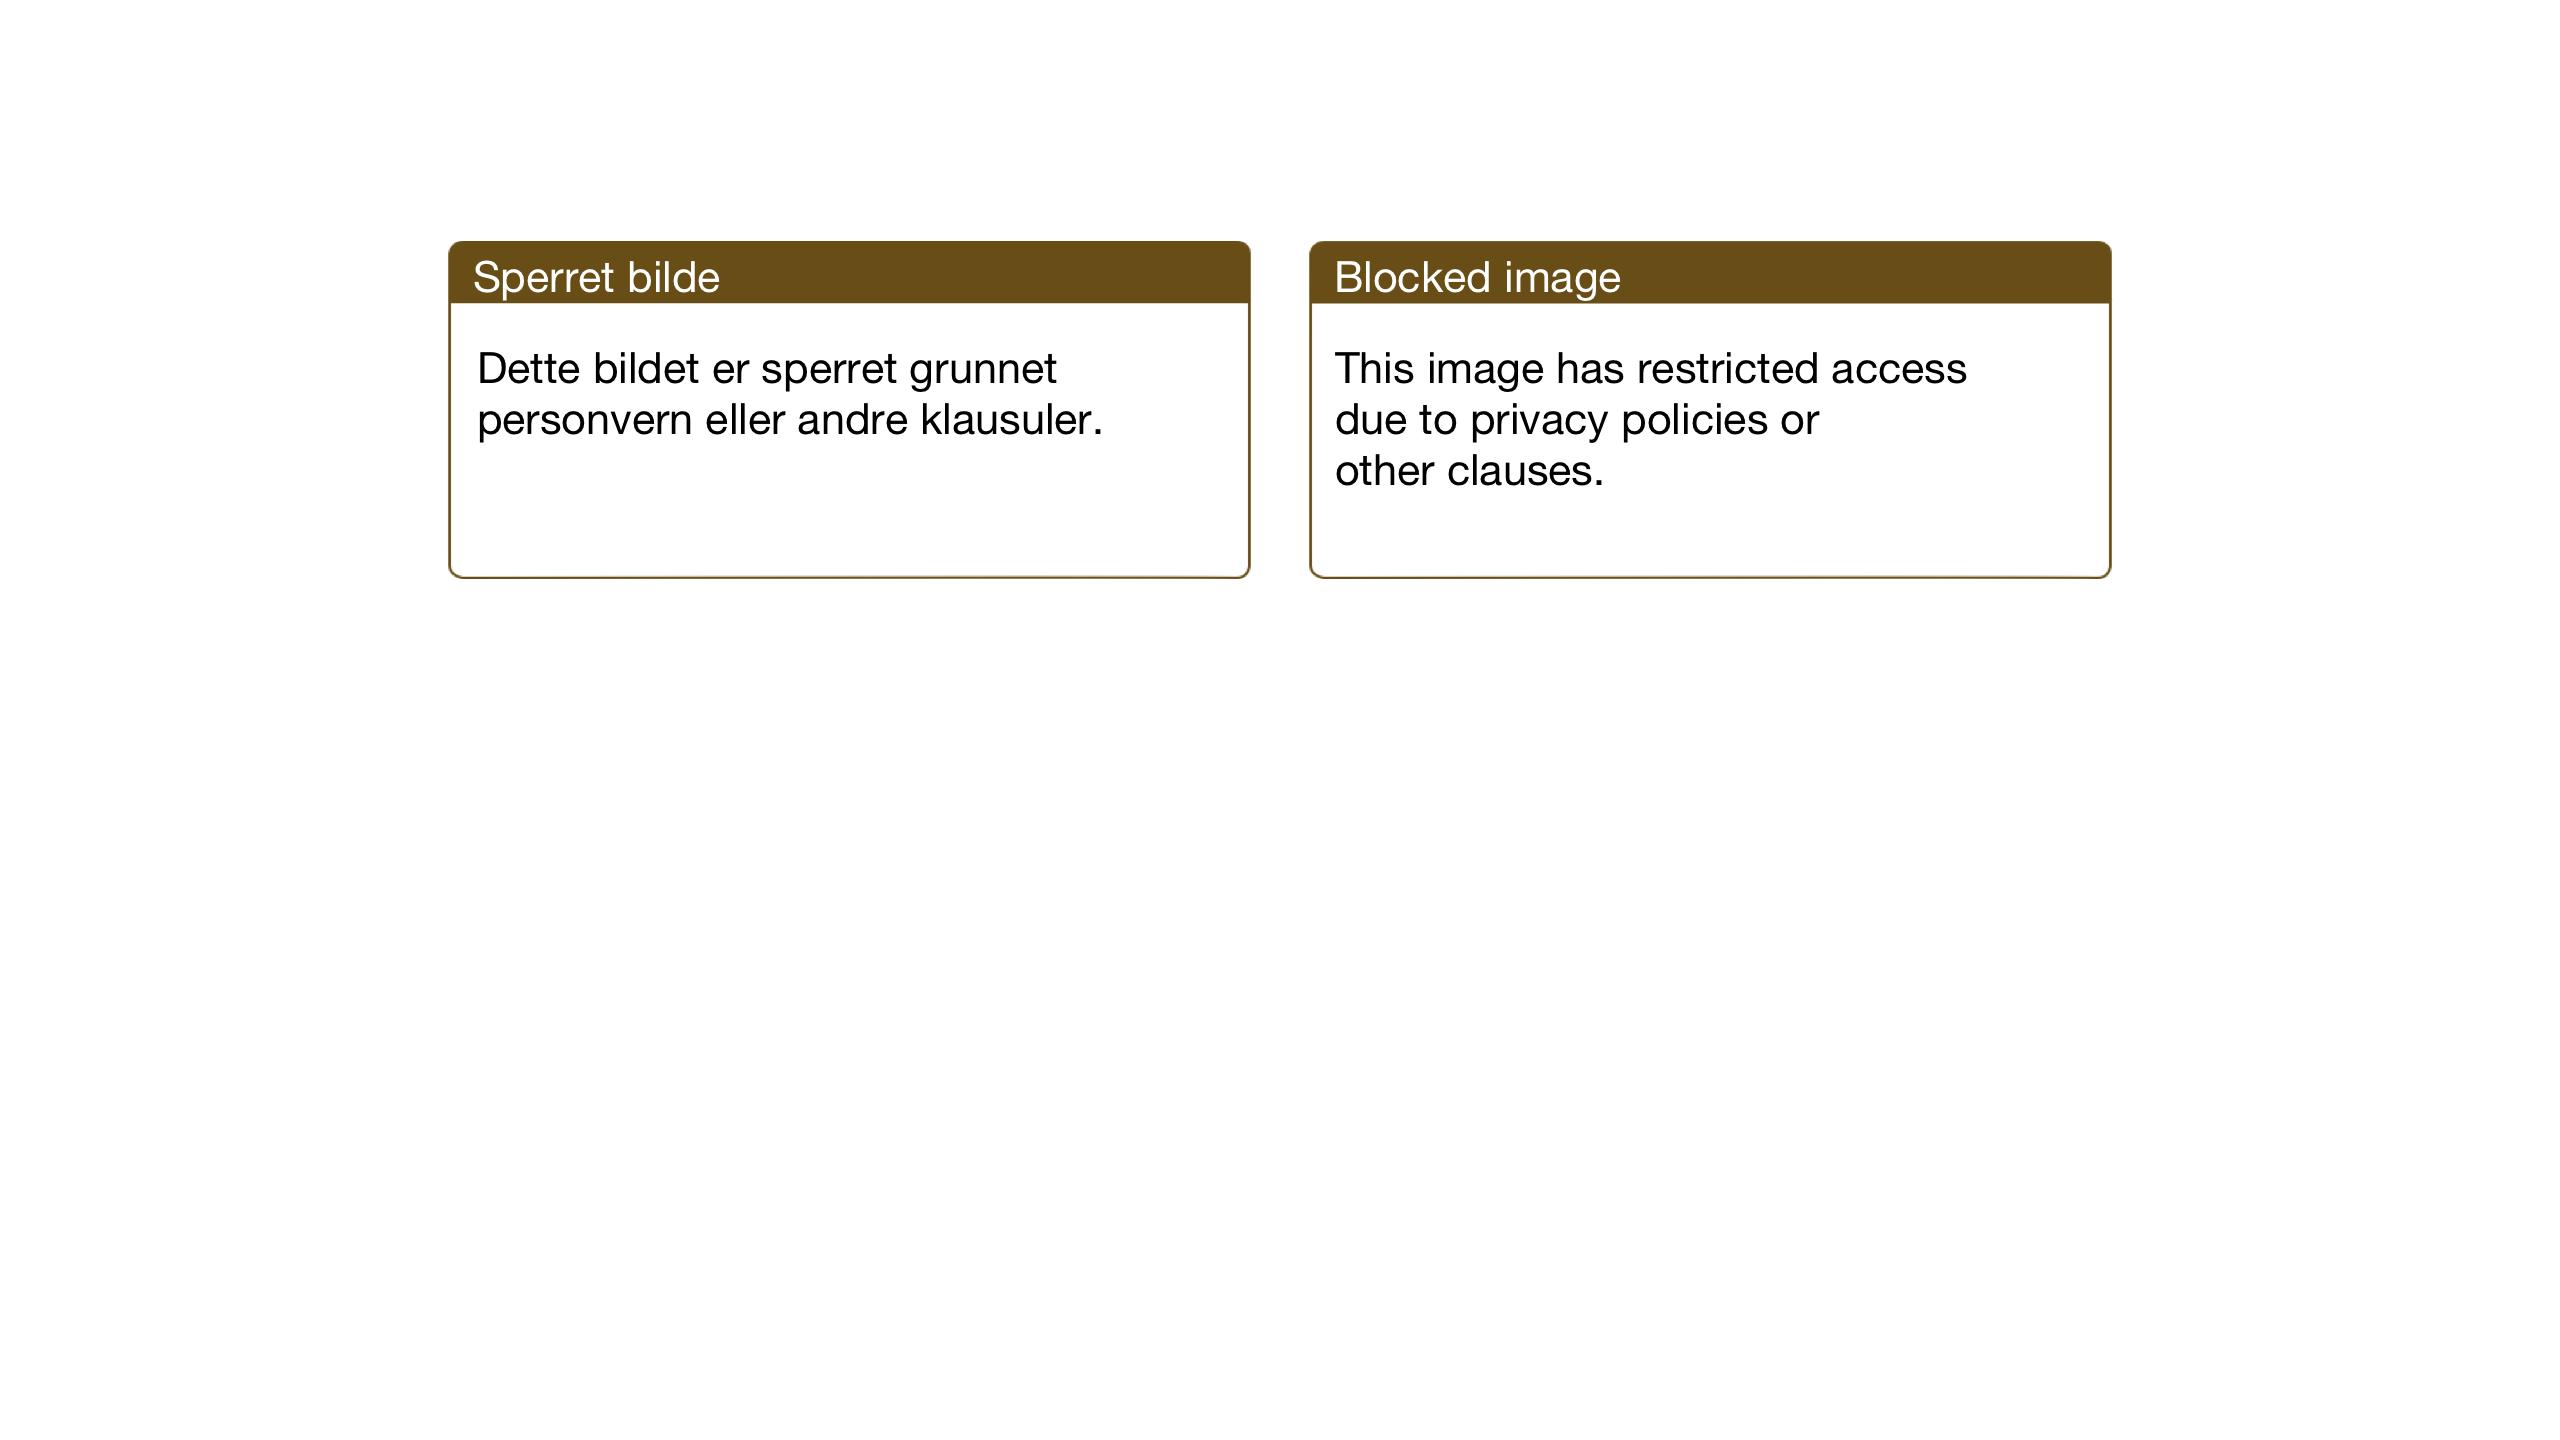 SAT, Ministerialprotokoller, klokkerbøker og fødselsregistre - Nordland, 843/L0640: Klokkerbok nr. 843C09, 1925-1941, s. 33